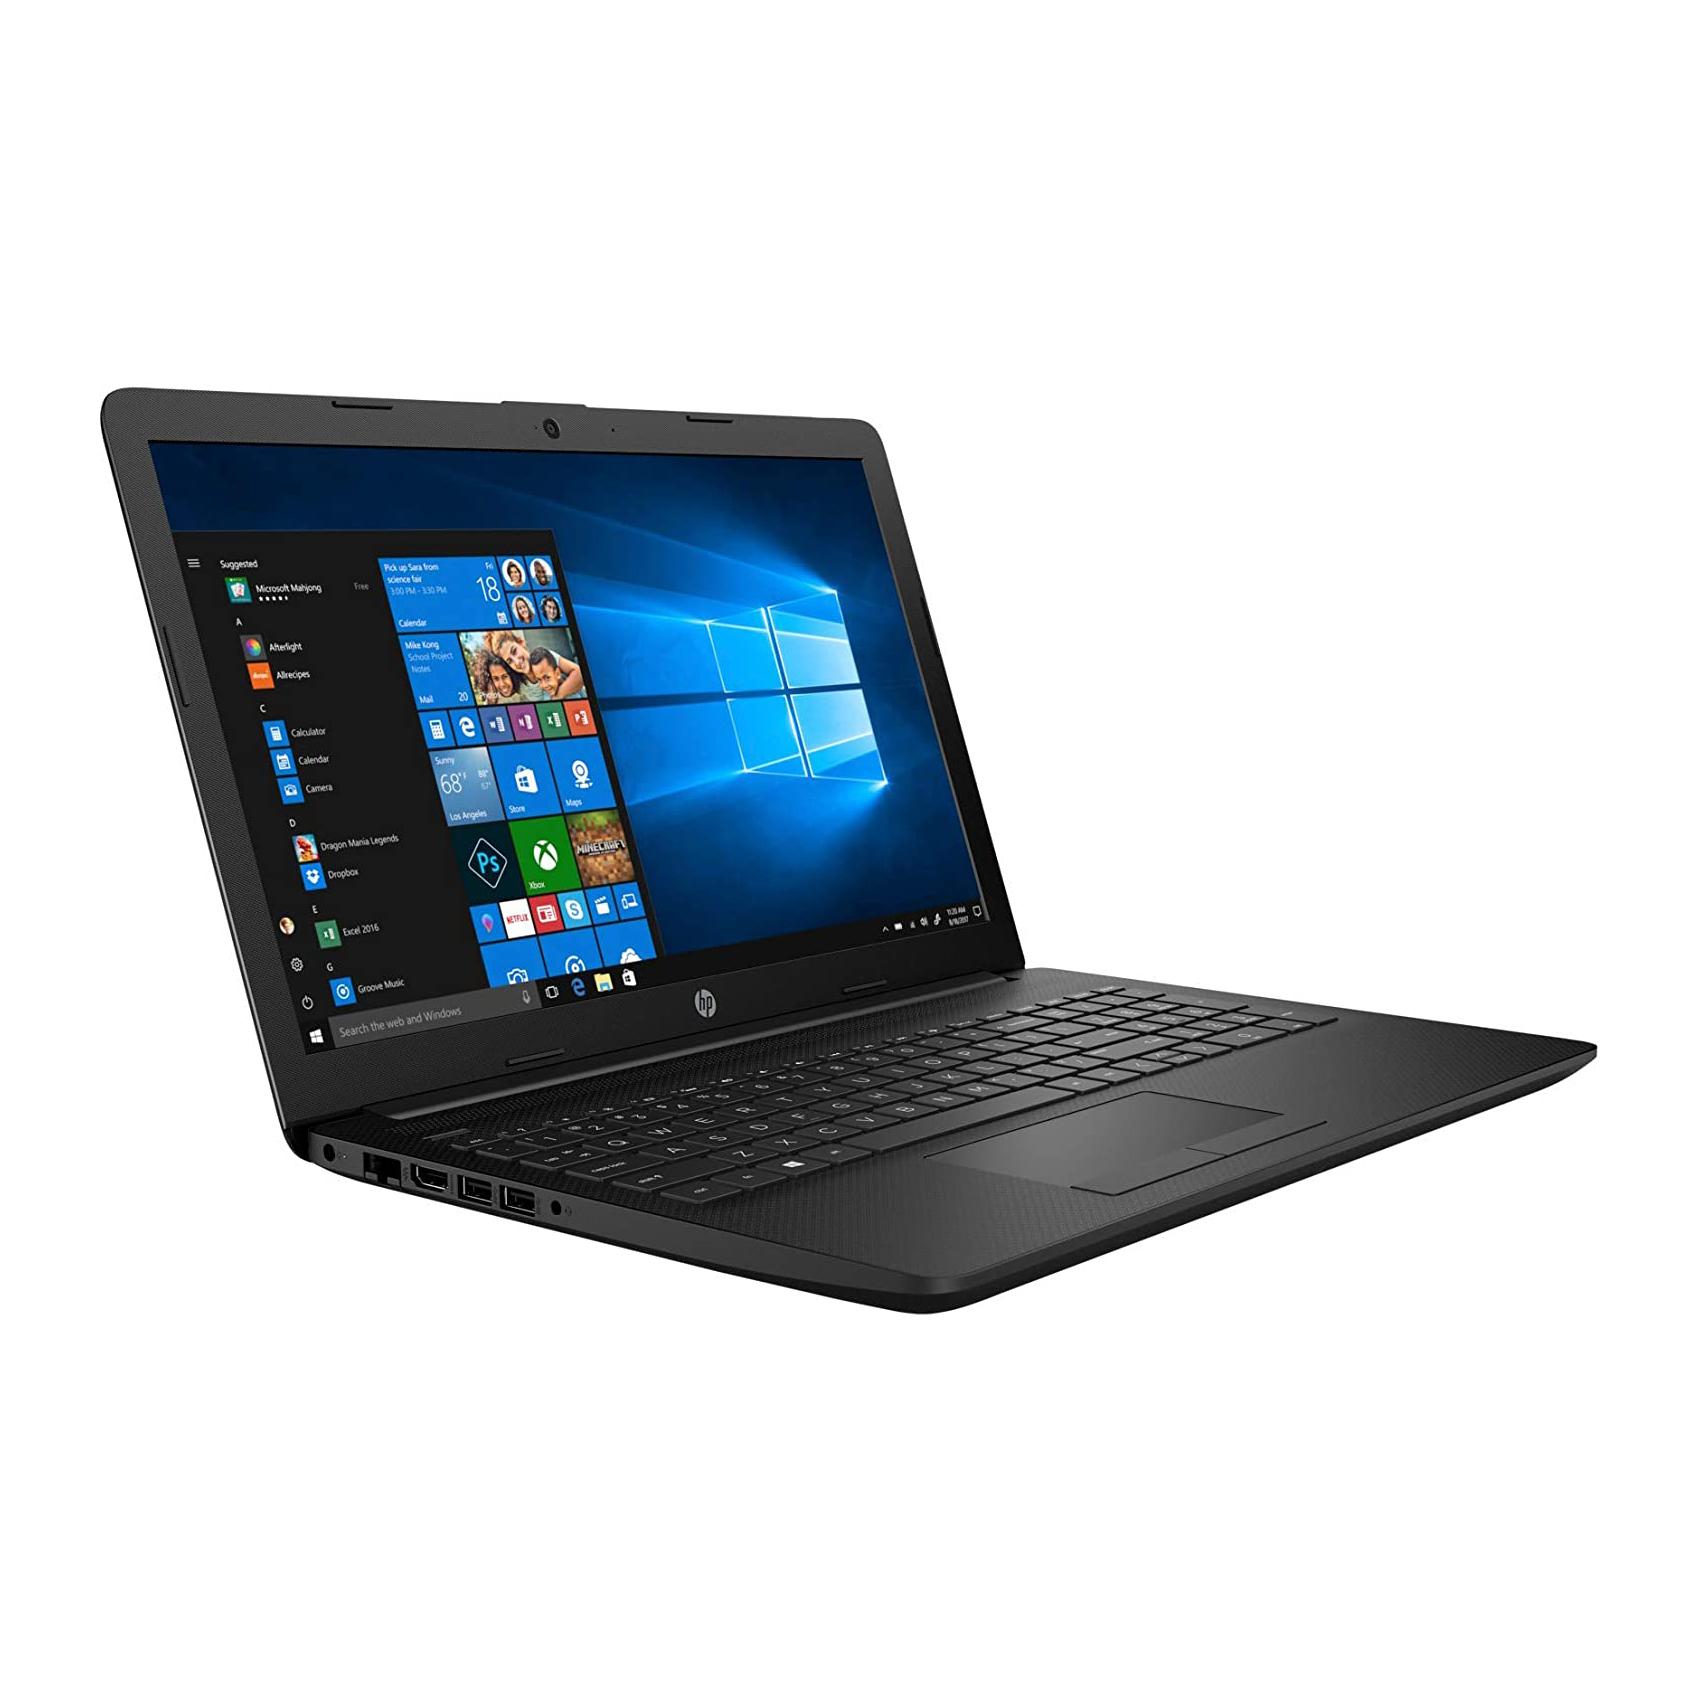 NOTEBOOK HP 15-DB1069AU AMD RYZEN R3-3200U 2.0GHz UP TO 2.6GHz 4M 4G 1T AMD RADEON VEGA 3 15.6 WIN10 BLACK ,Laptop Pc